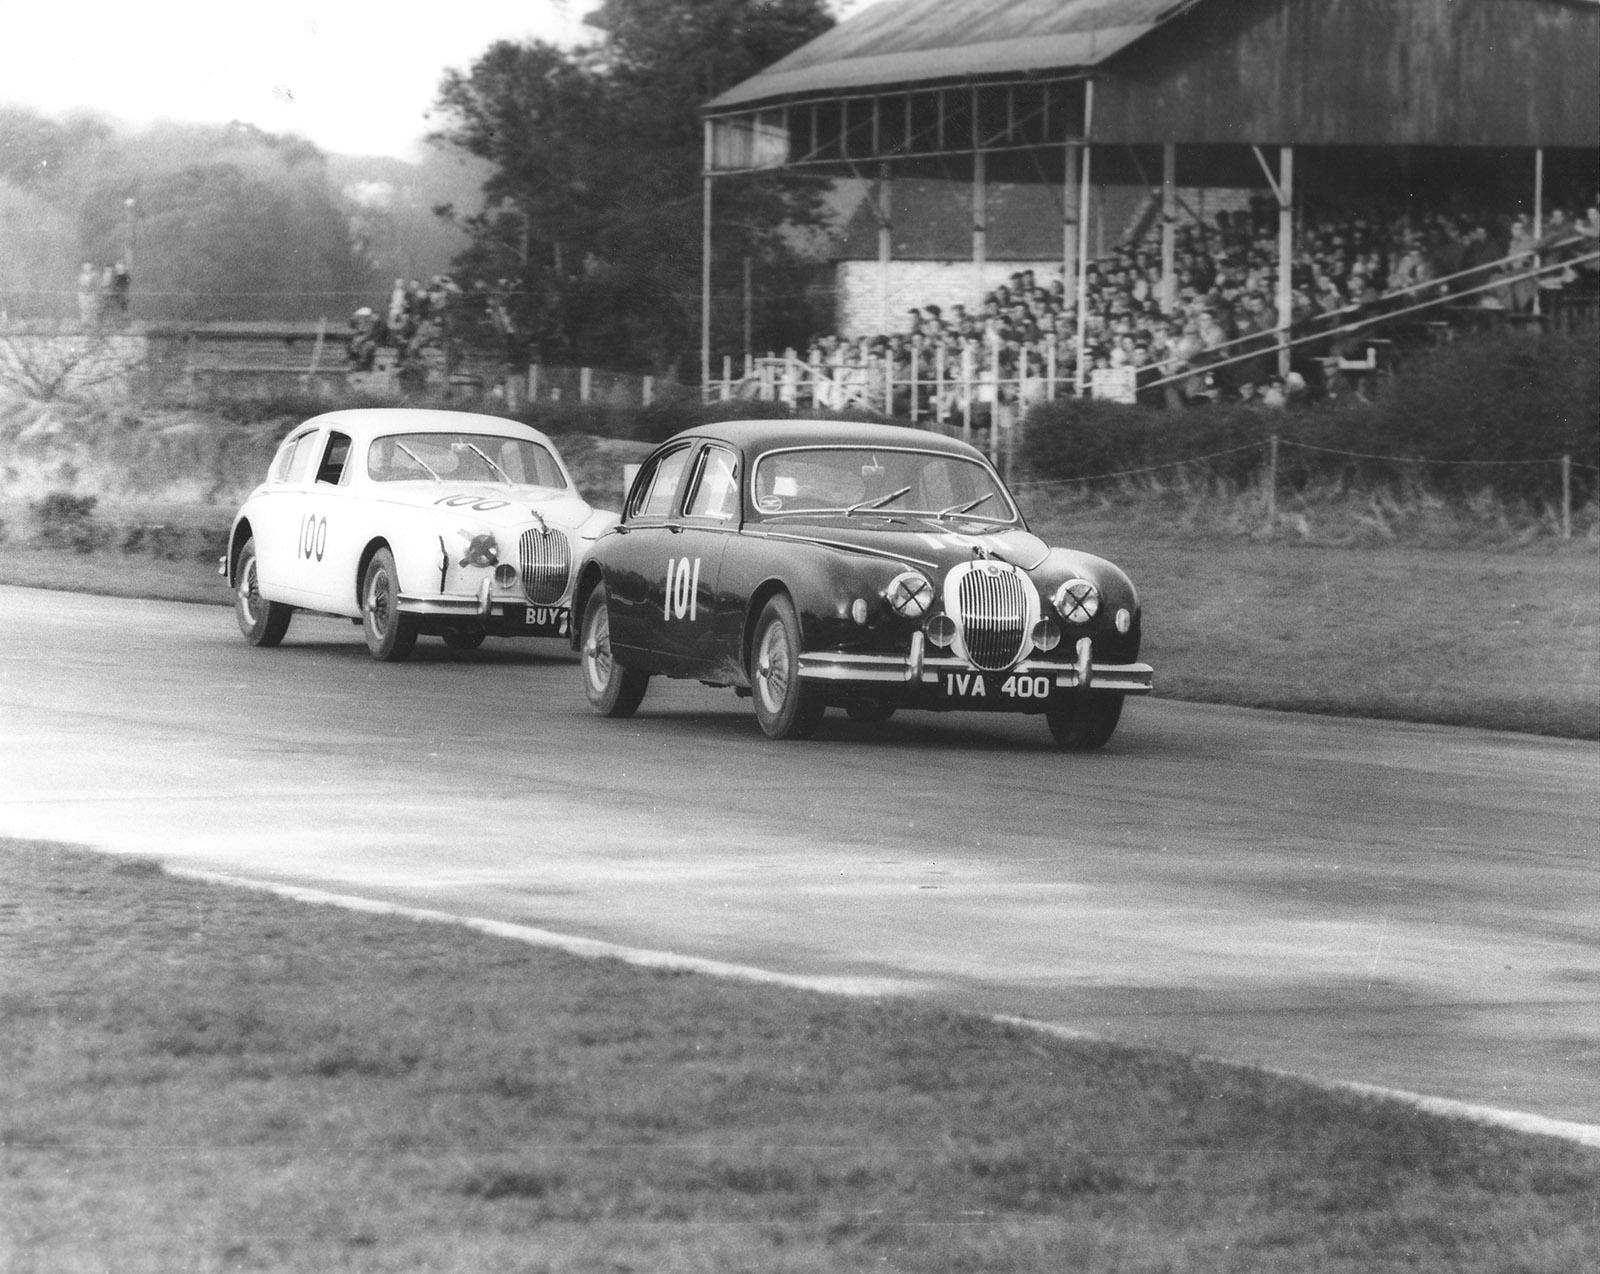 IVA 400 Goodwood Faster 1959 Bueb Leads Salvadori web.jpg